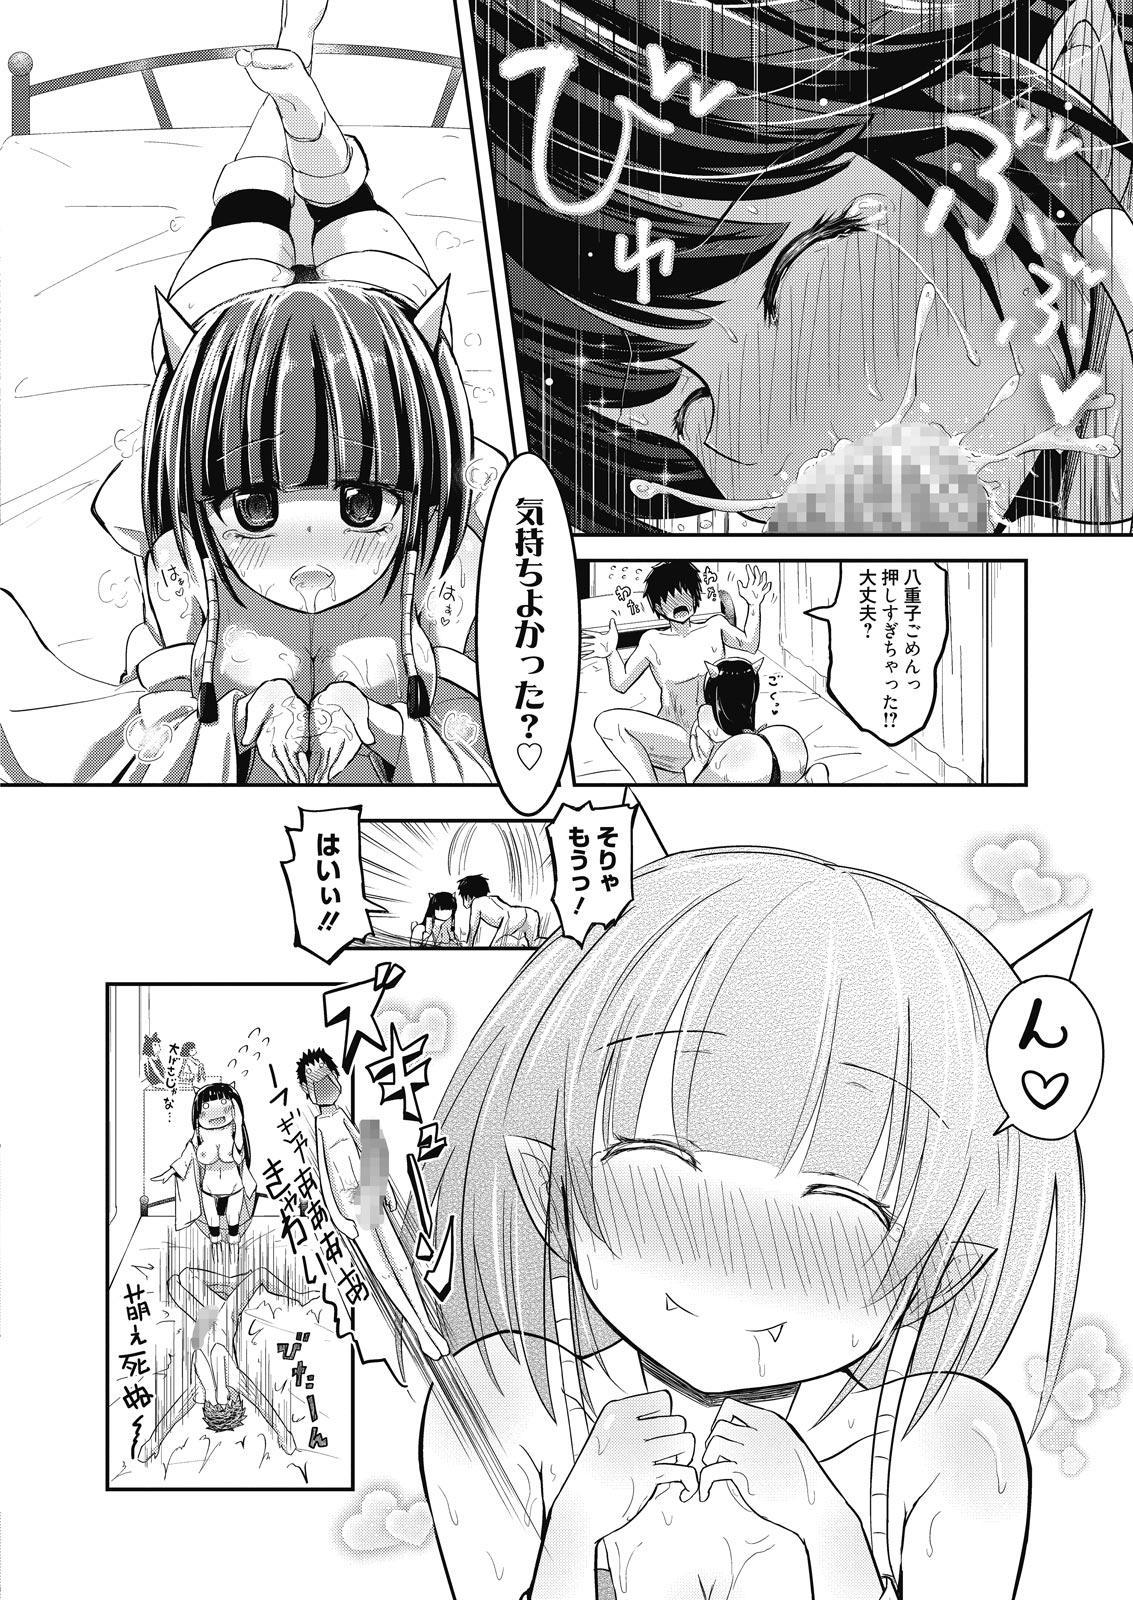 Web Manga Bangaichi Vol. 7 123